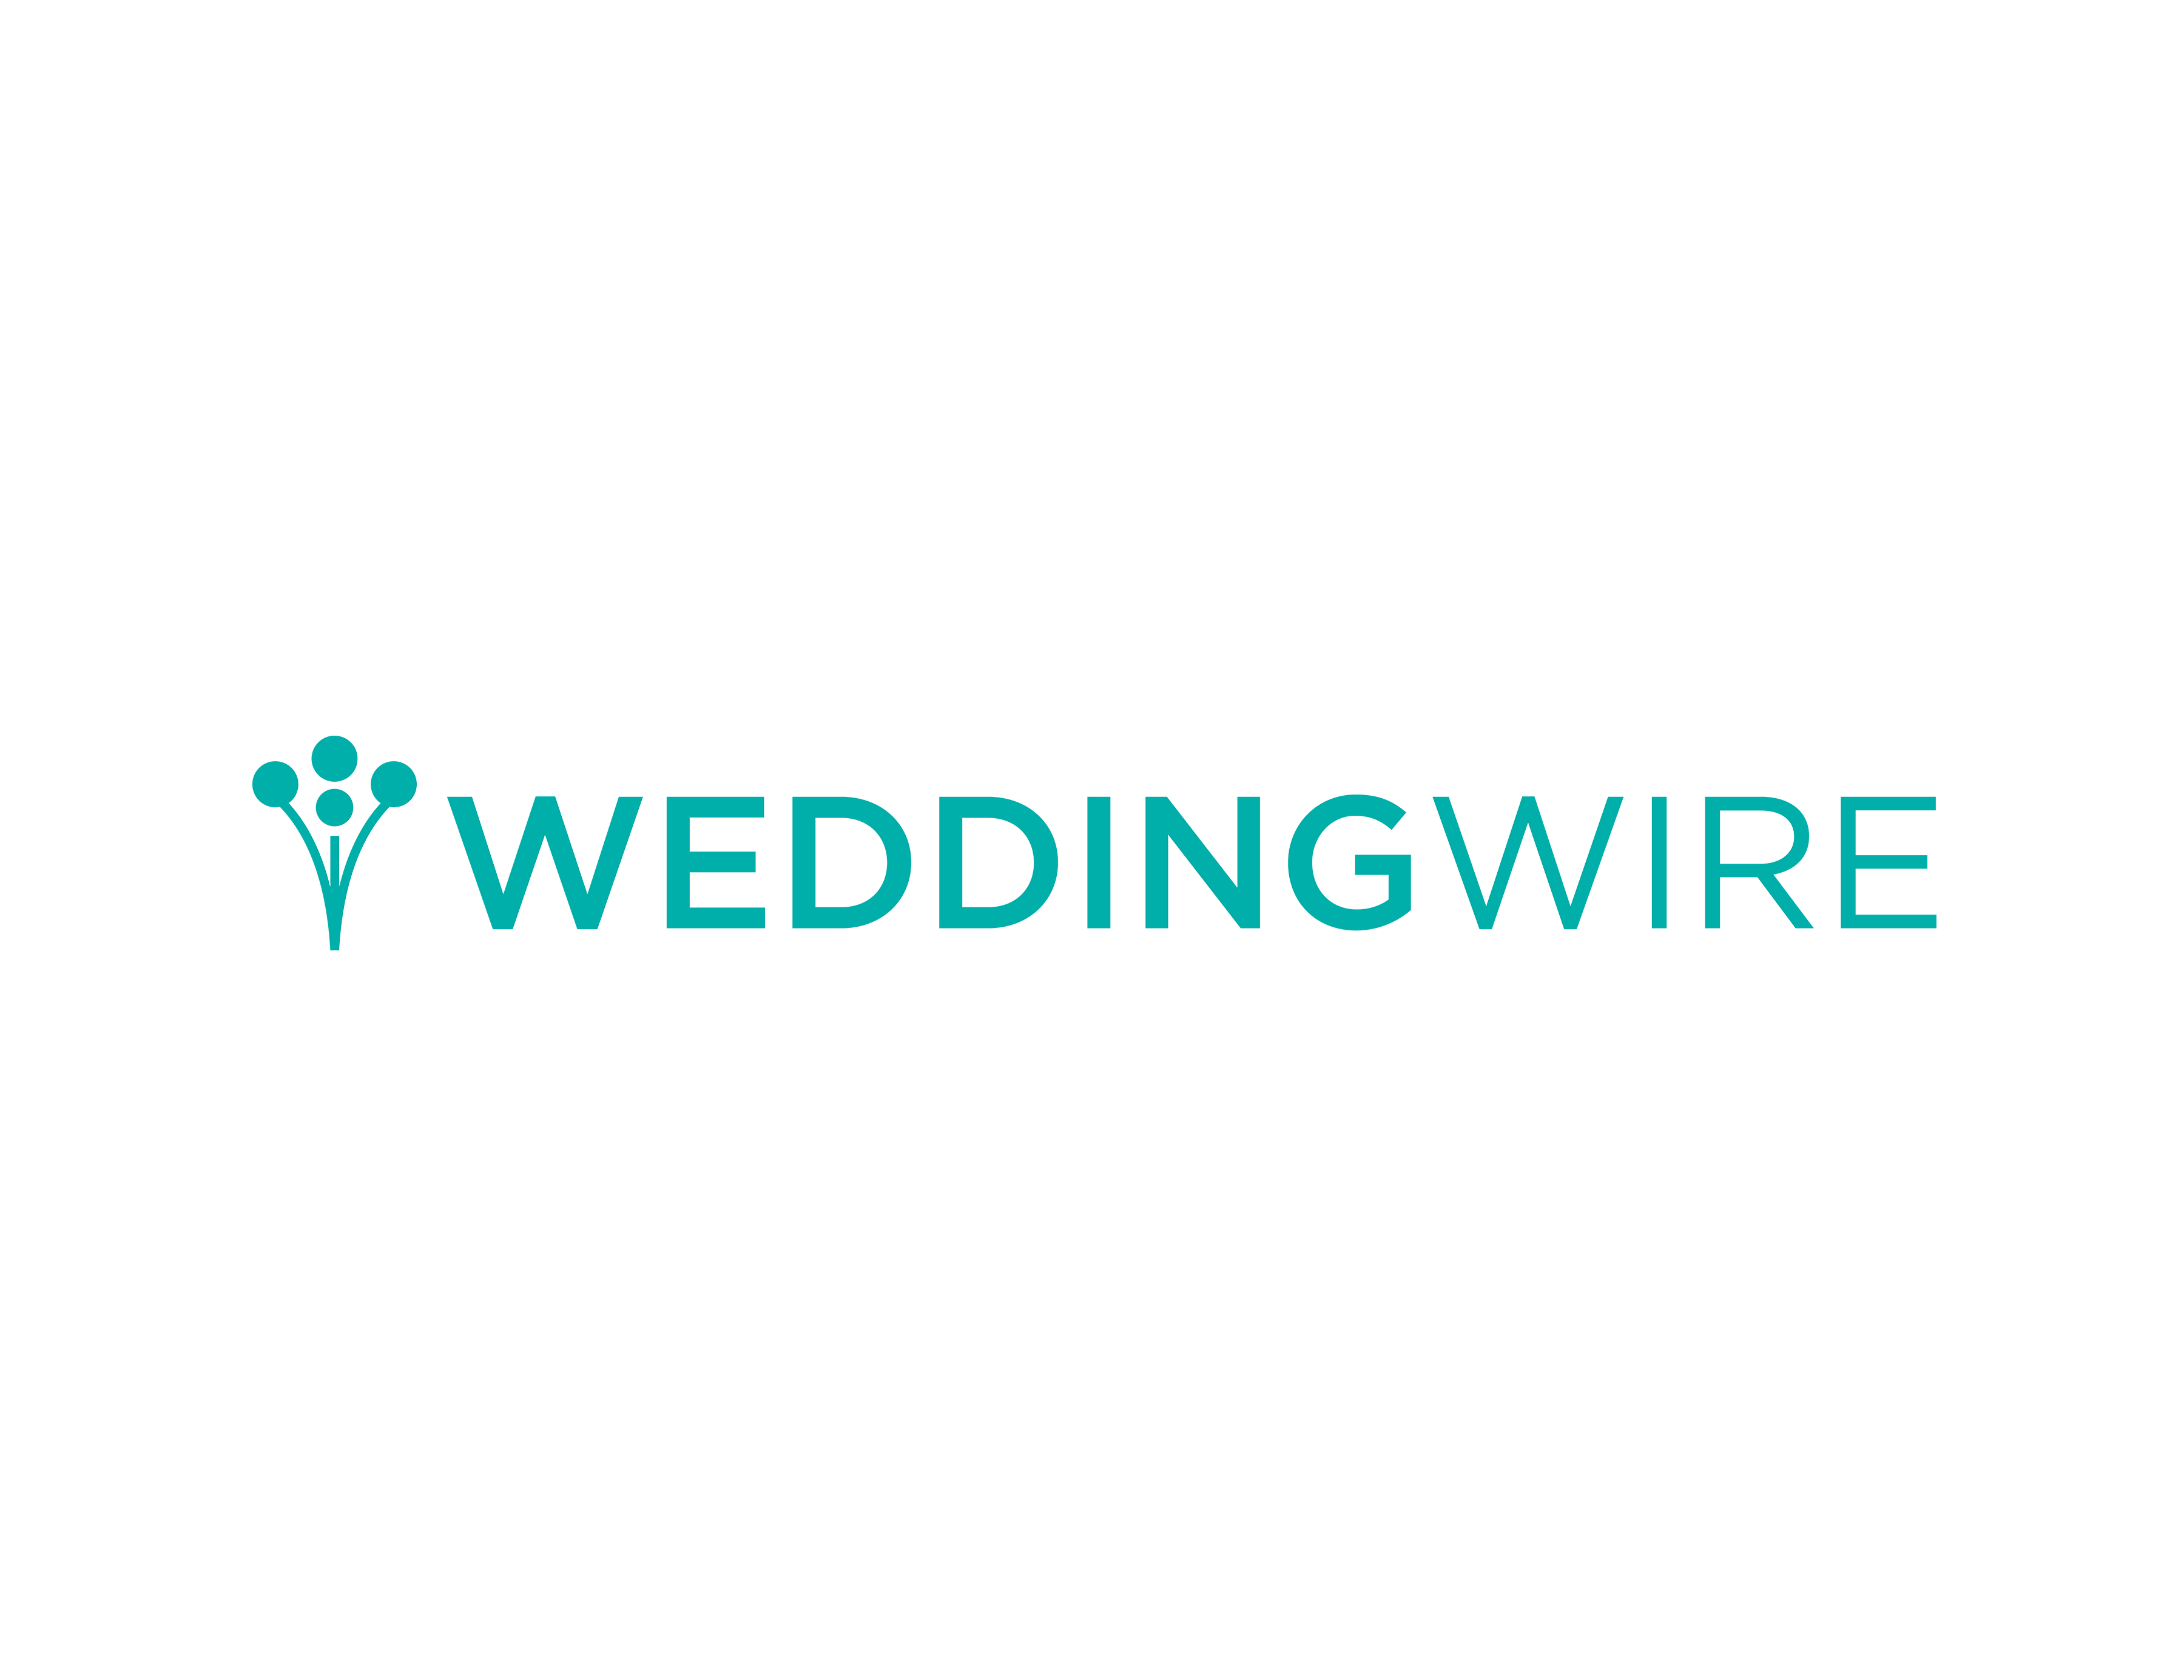 wedding wire - Logojoy